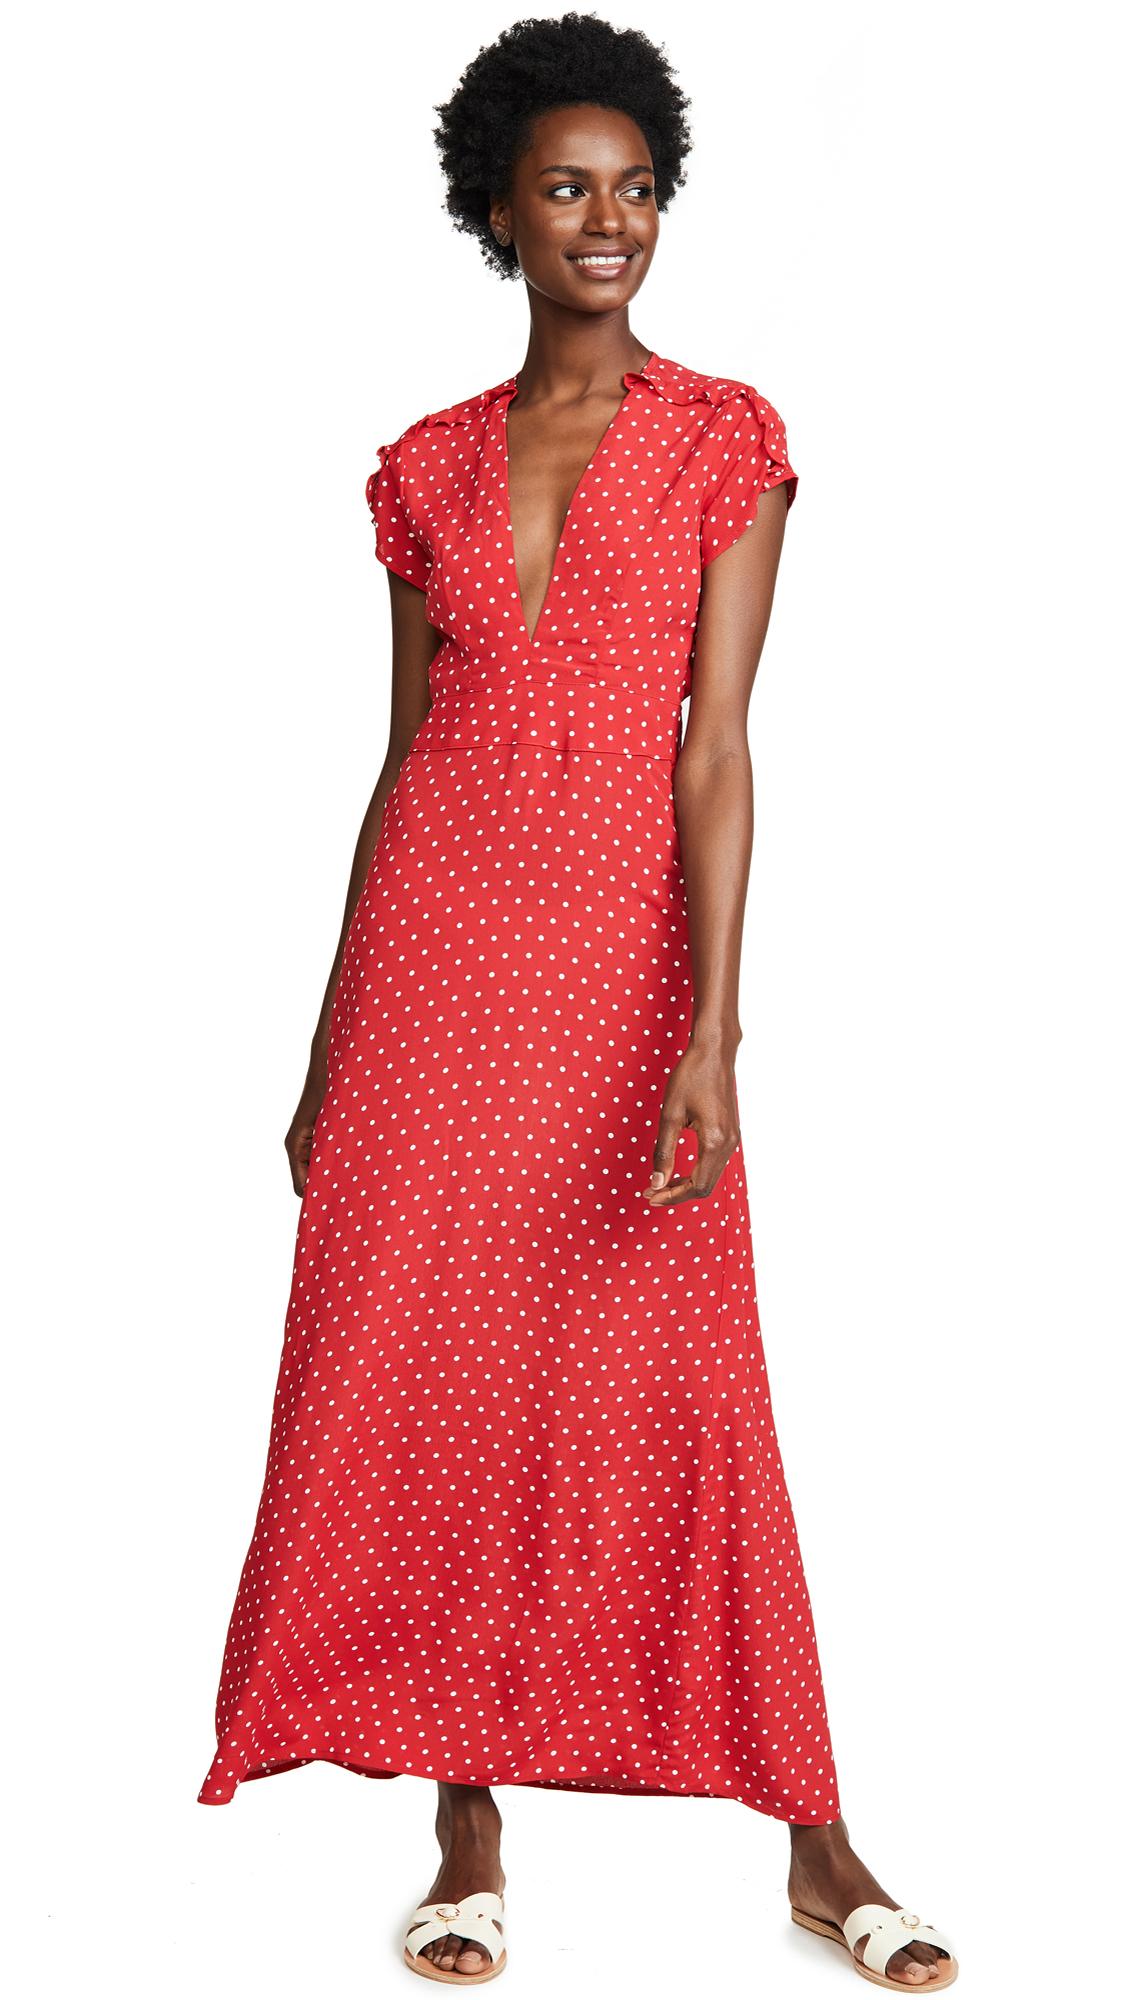 Flynn Skye Valentina Maxi Dress In Cherry Dots